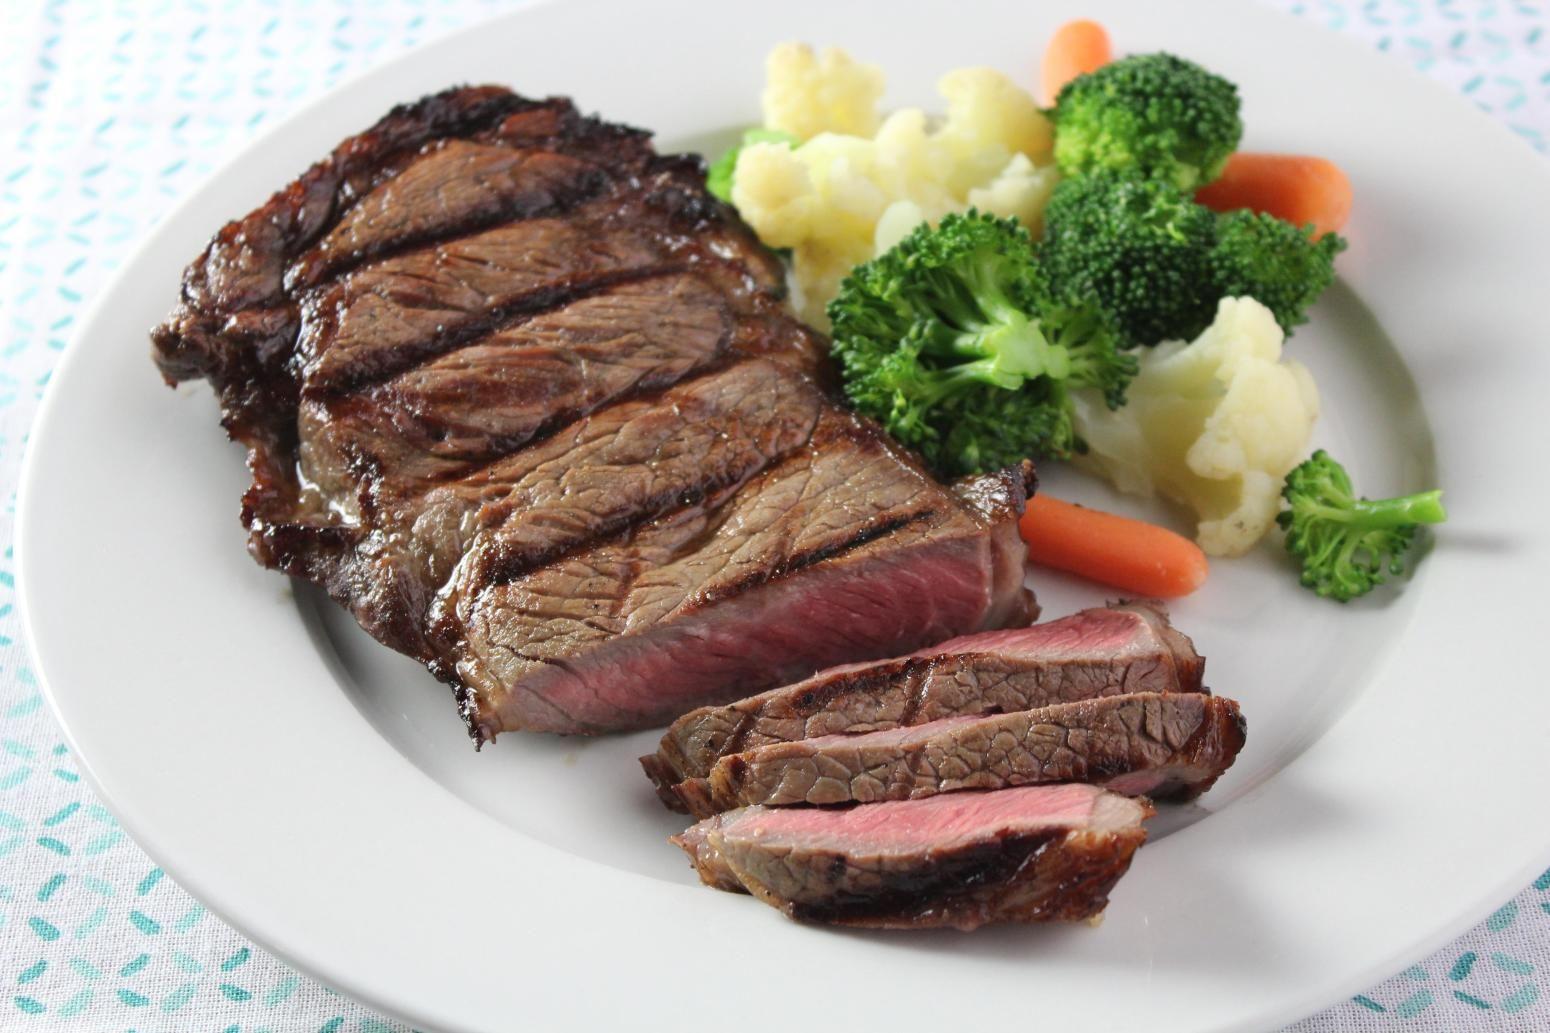 Lisa's Grilled Steaks Recipe Grilled steak recipes